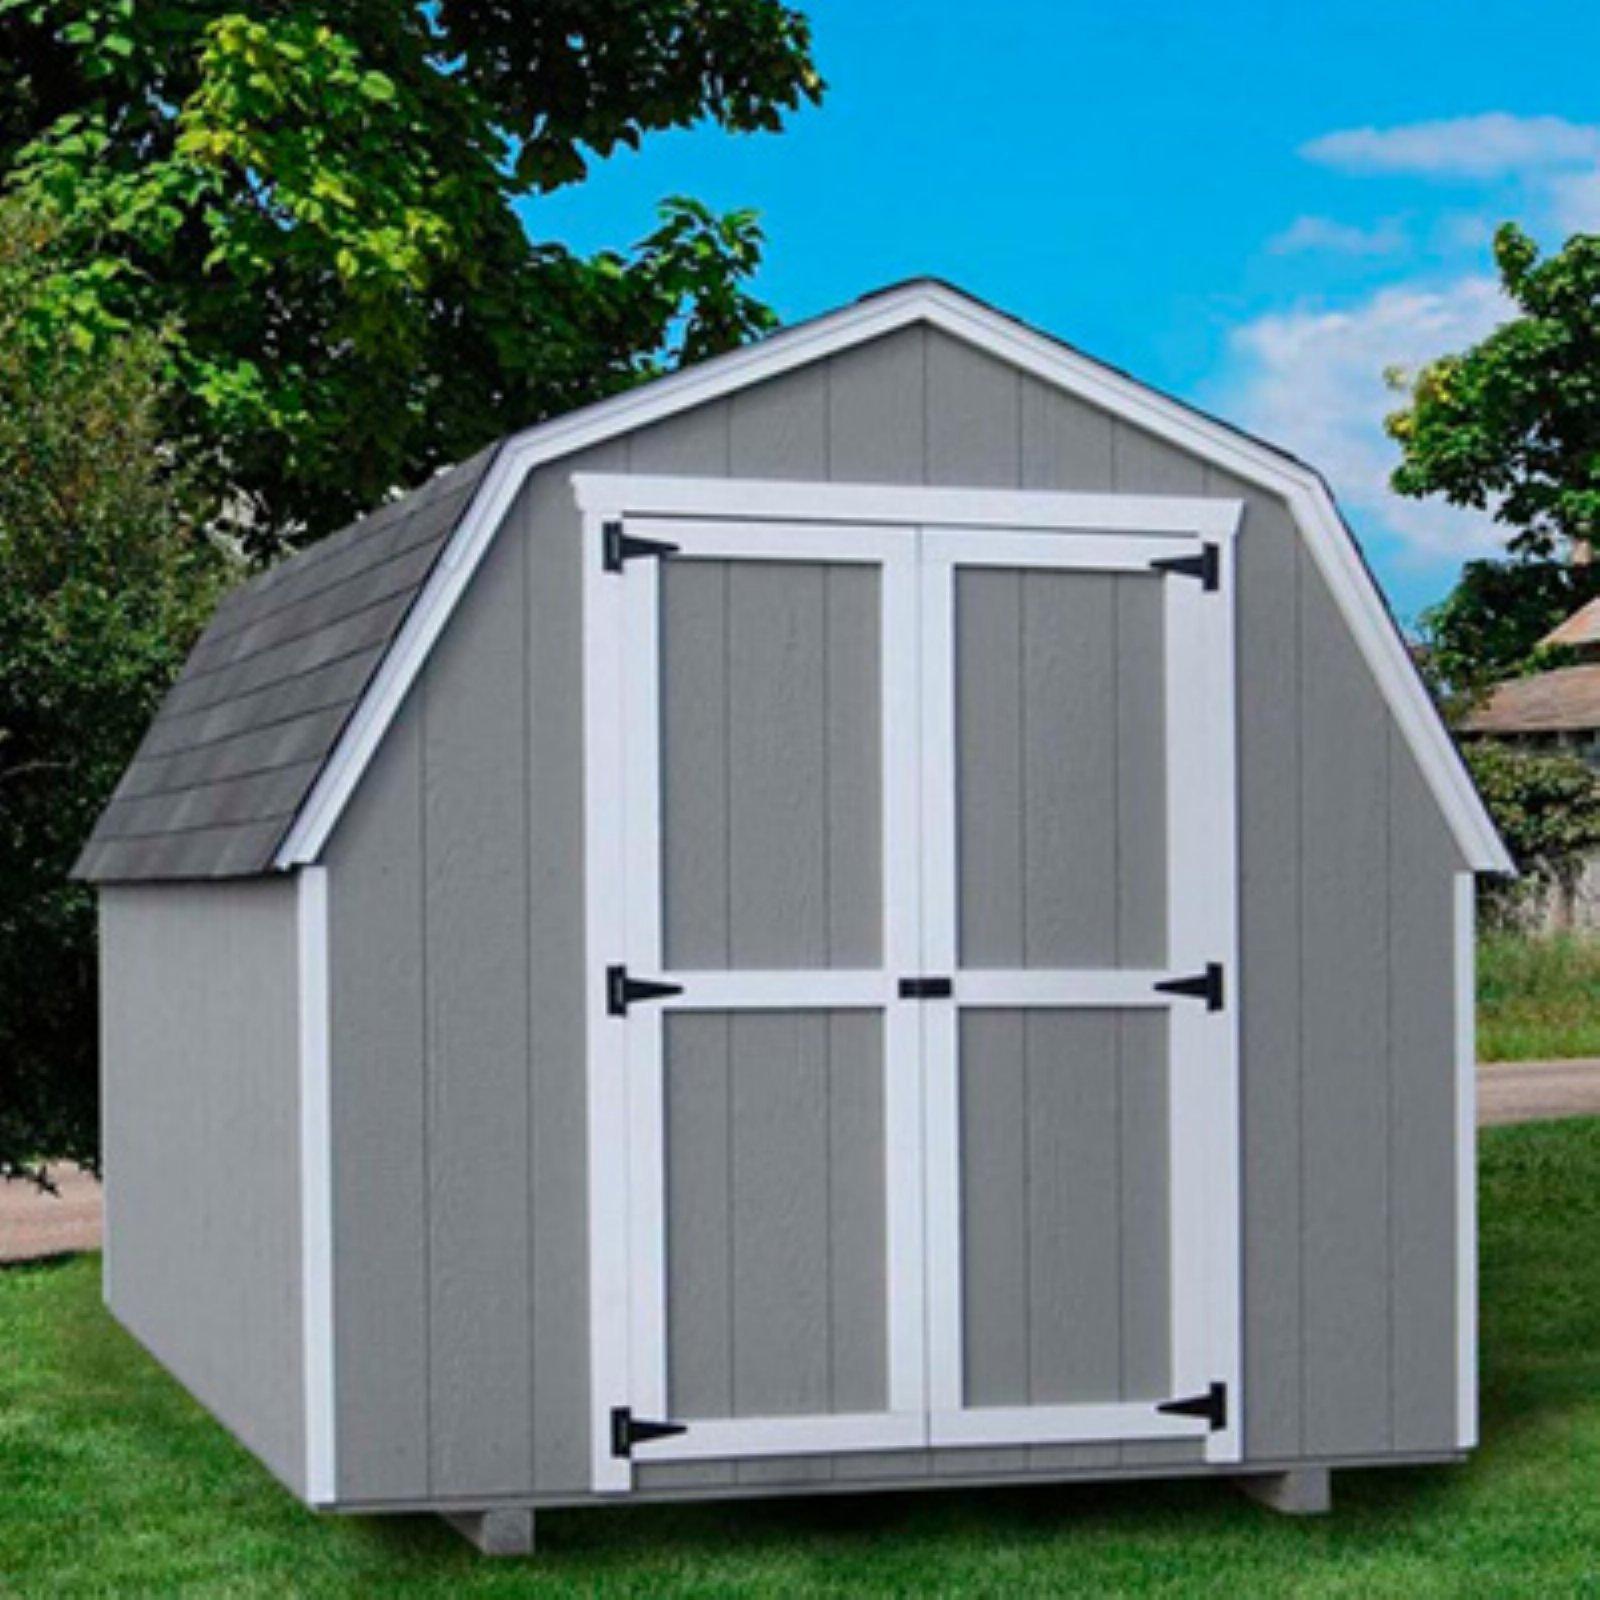 Little Cottage 12 x 10 ft. Value Gambrel Barn Precut Storage Shed - 4 ft. Barn